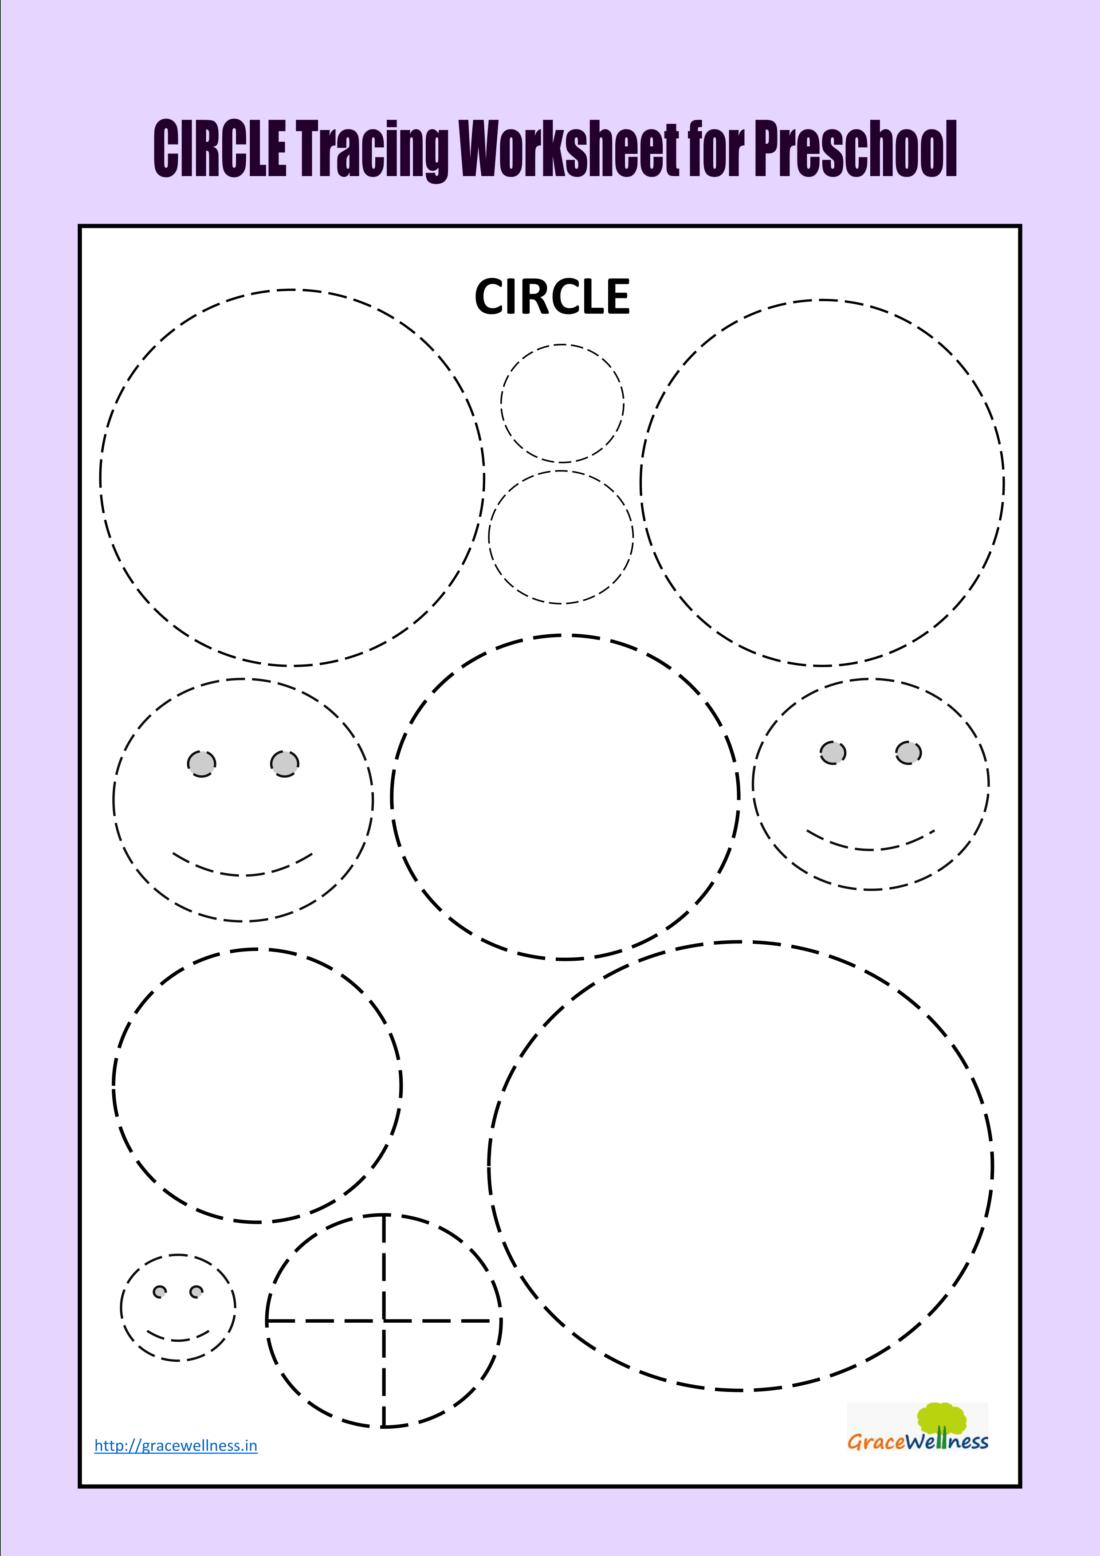 Circle Tracing Worksheet For Preschool Trace And Color Printable Shape  Worksheet - Download Printables Worksheets Digital Art Read Articles